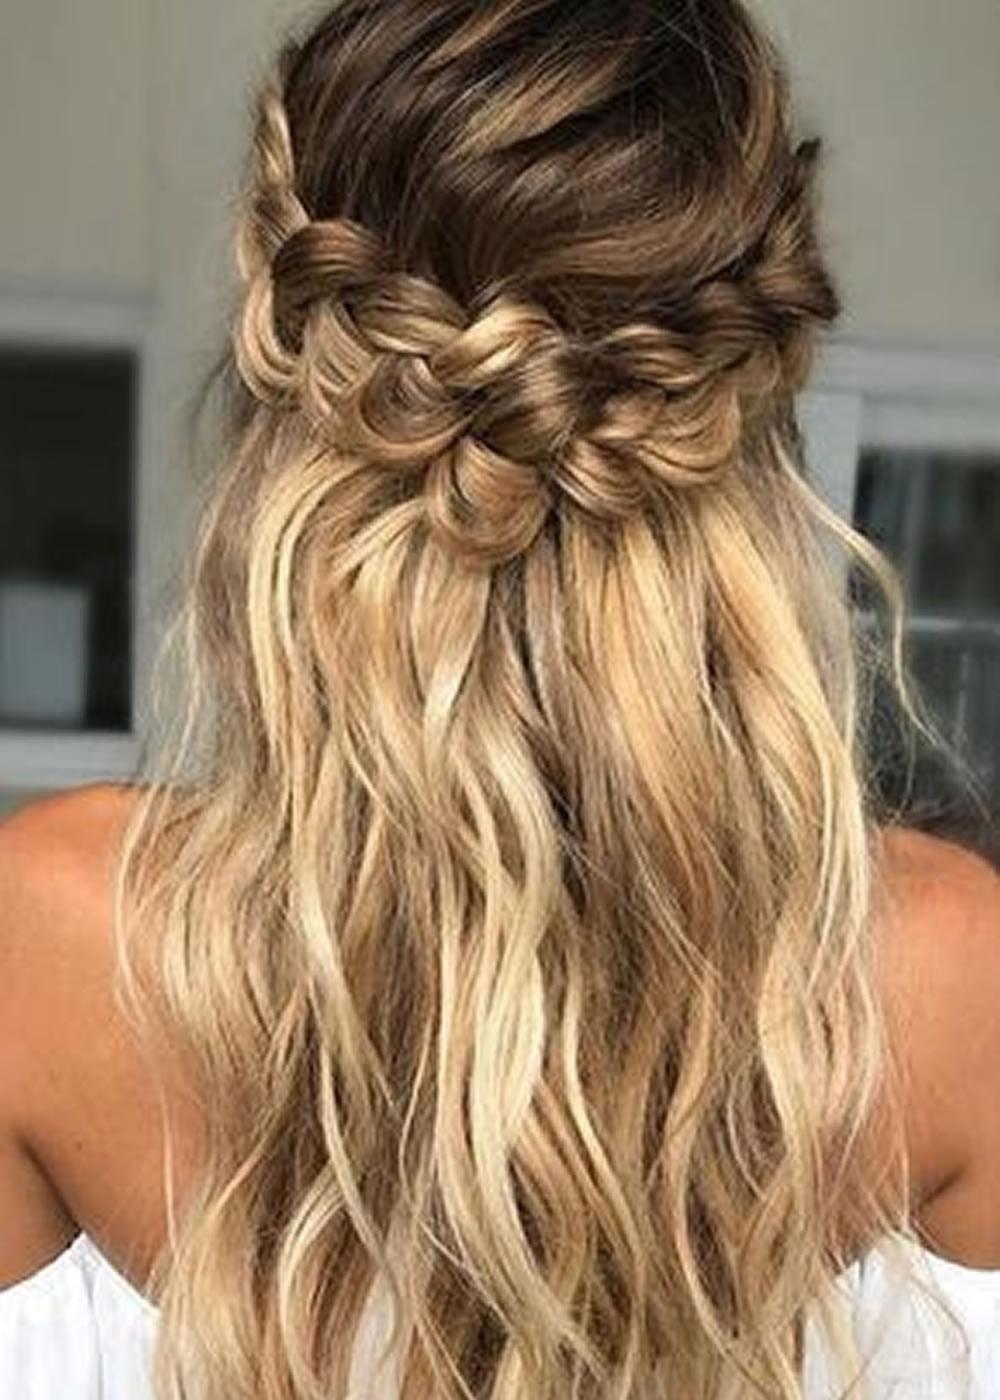 25 Very Stylish Soft Braided Hairstyles ideas 2018-2019 ... - photo #24